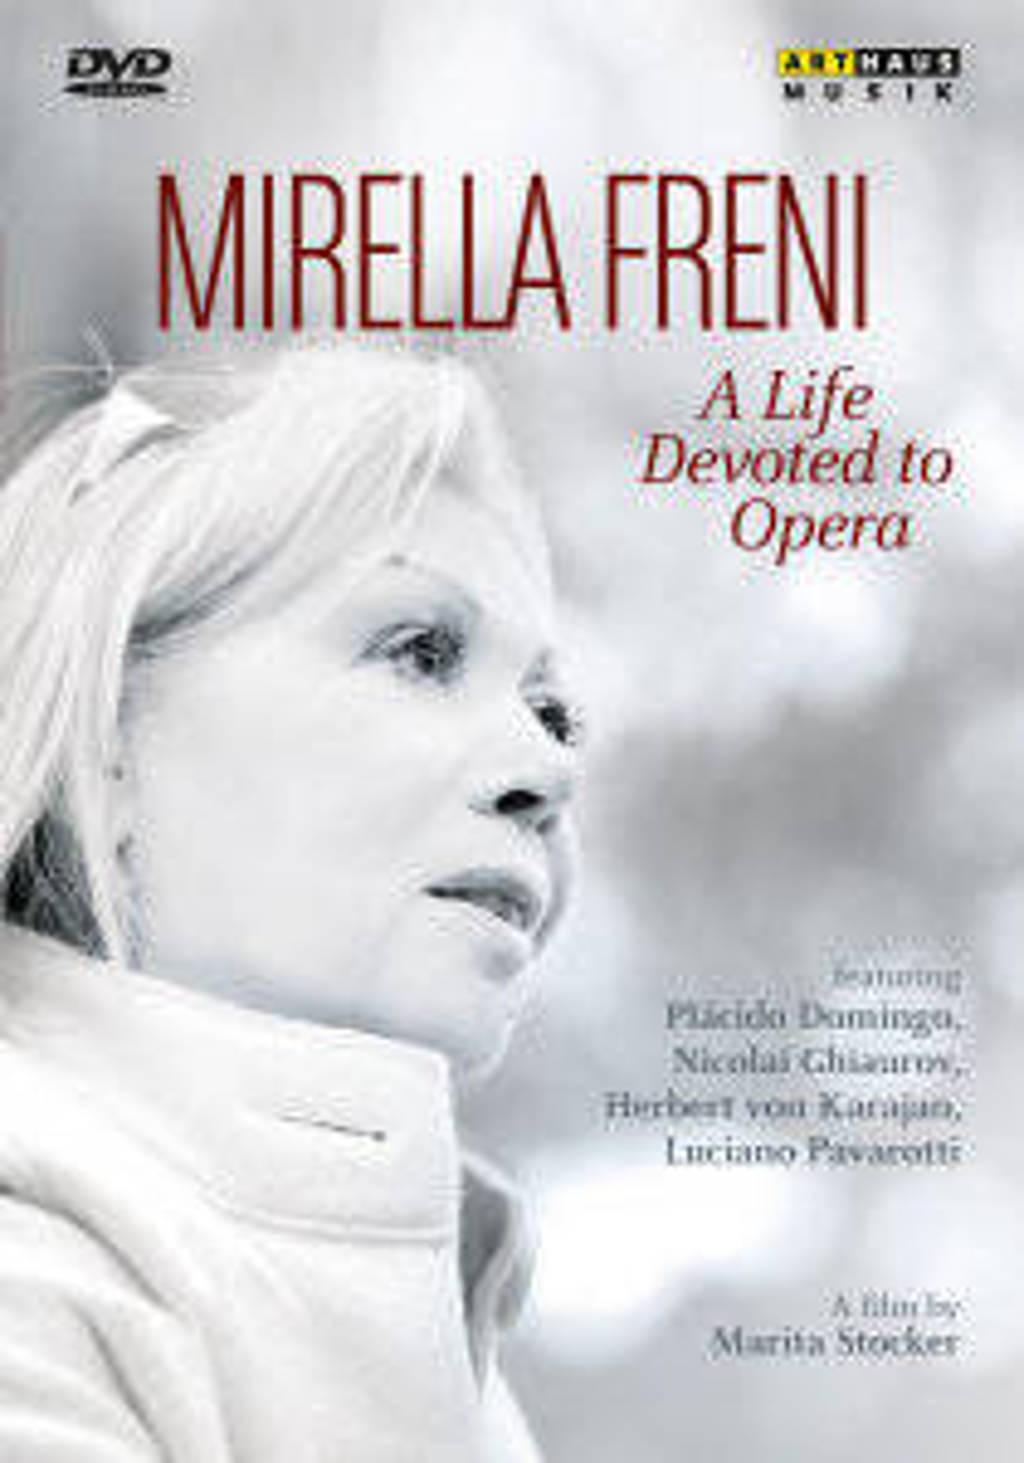 Documentaire - Freni, A Live Devoted To Opera (DVD)